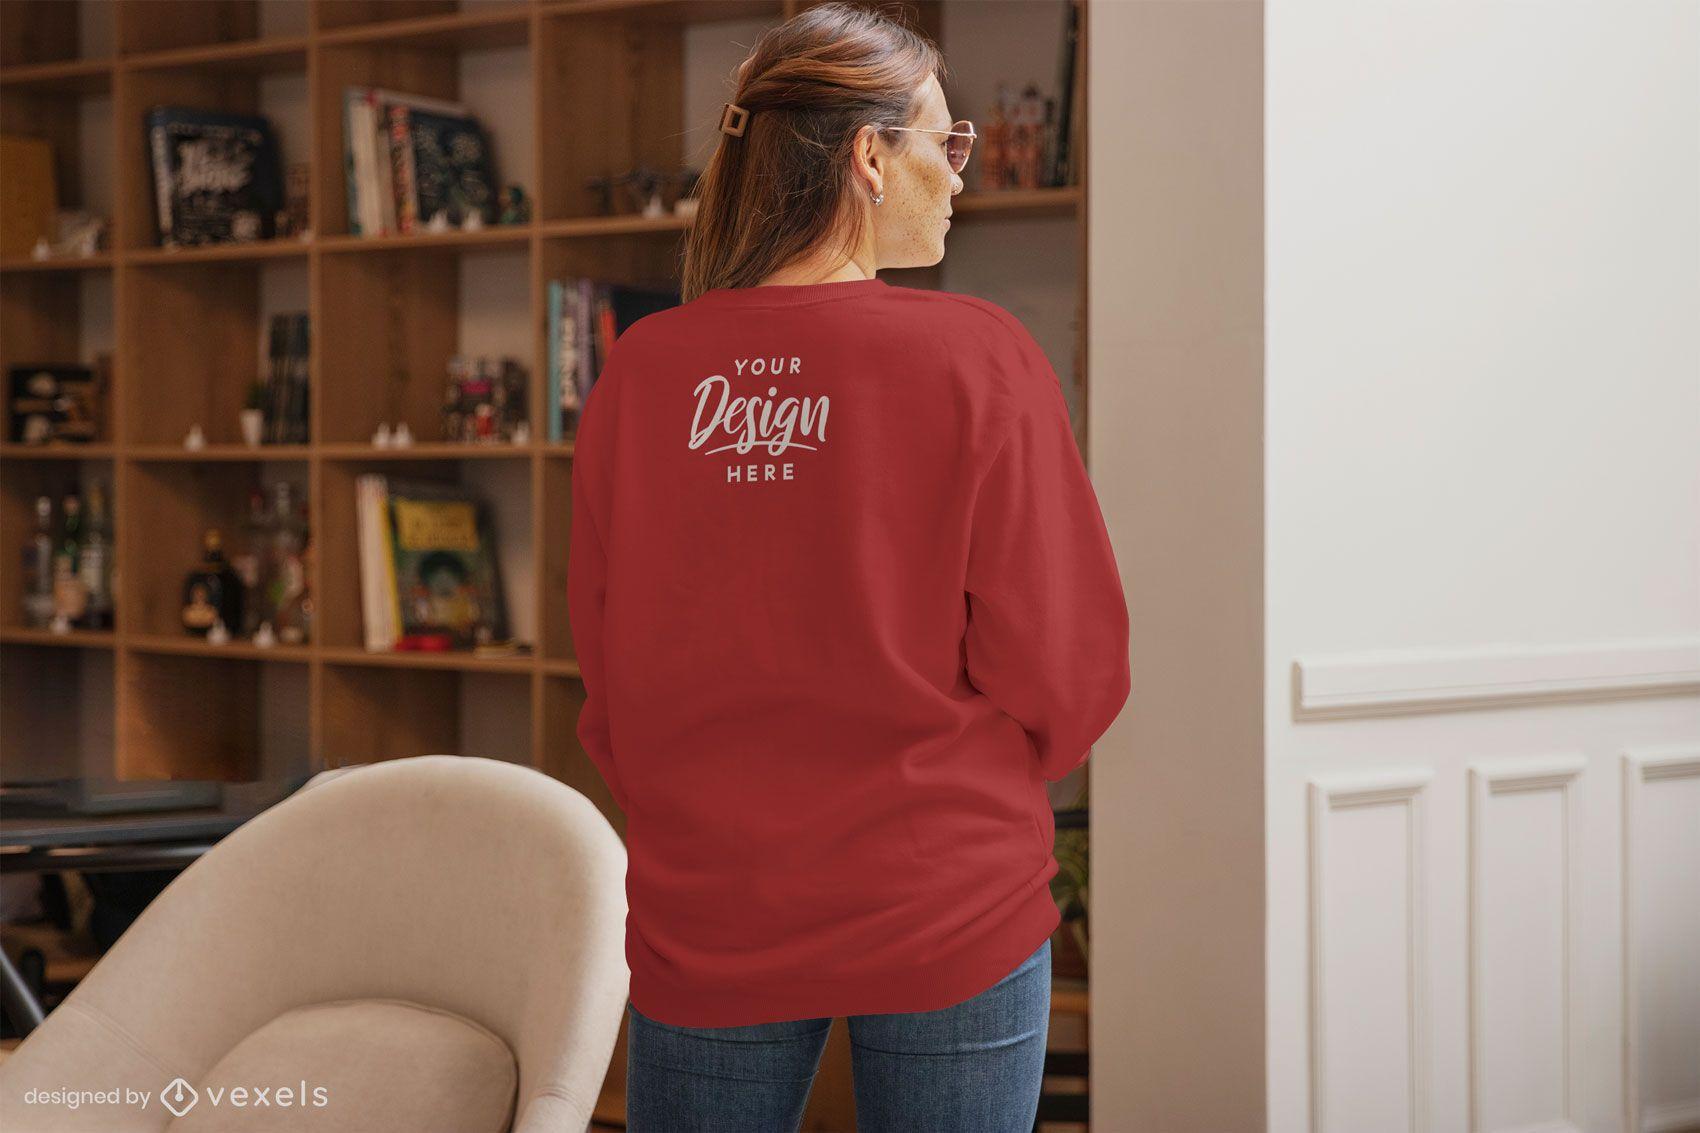 Frau rückwärts Sweatshirt nach Hause Modell